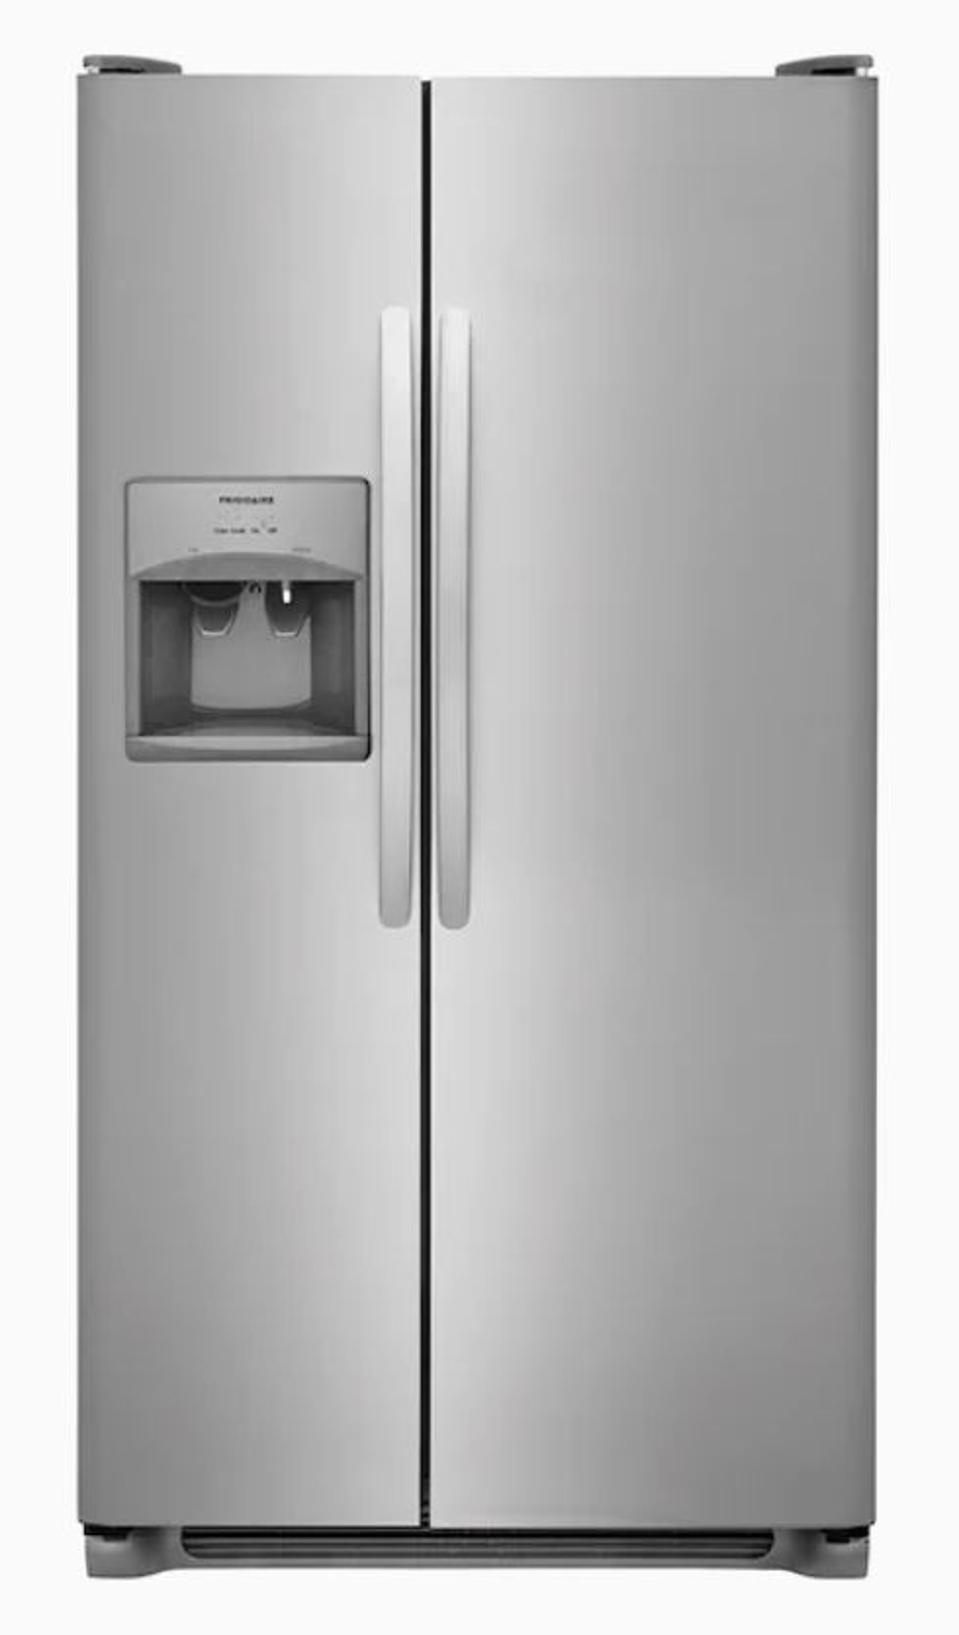 Frigidaire 25.5-cu ft Side-by-Side Refrigerator